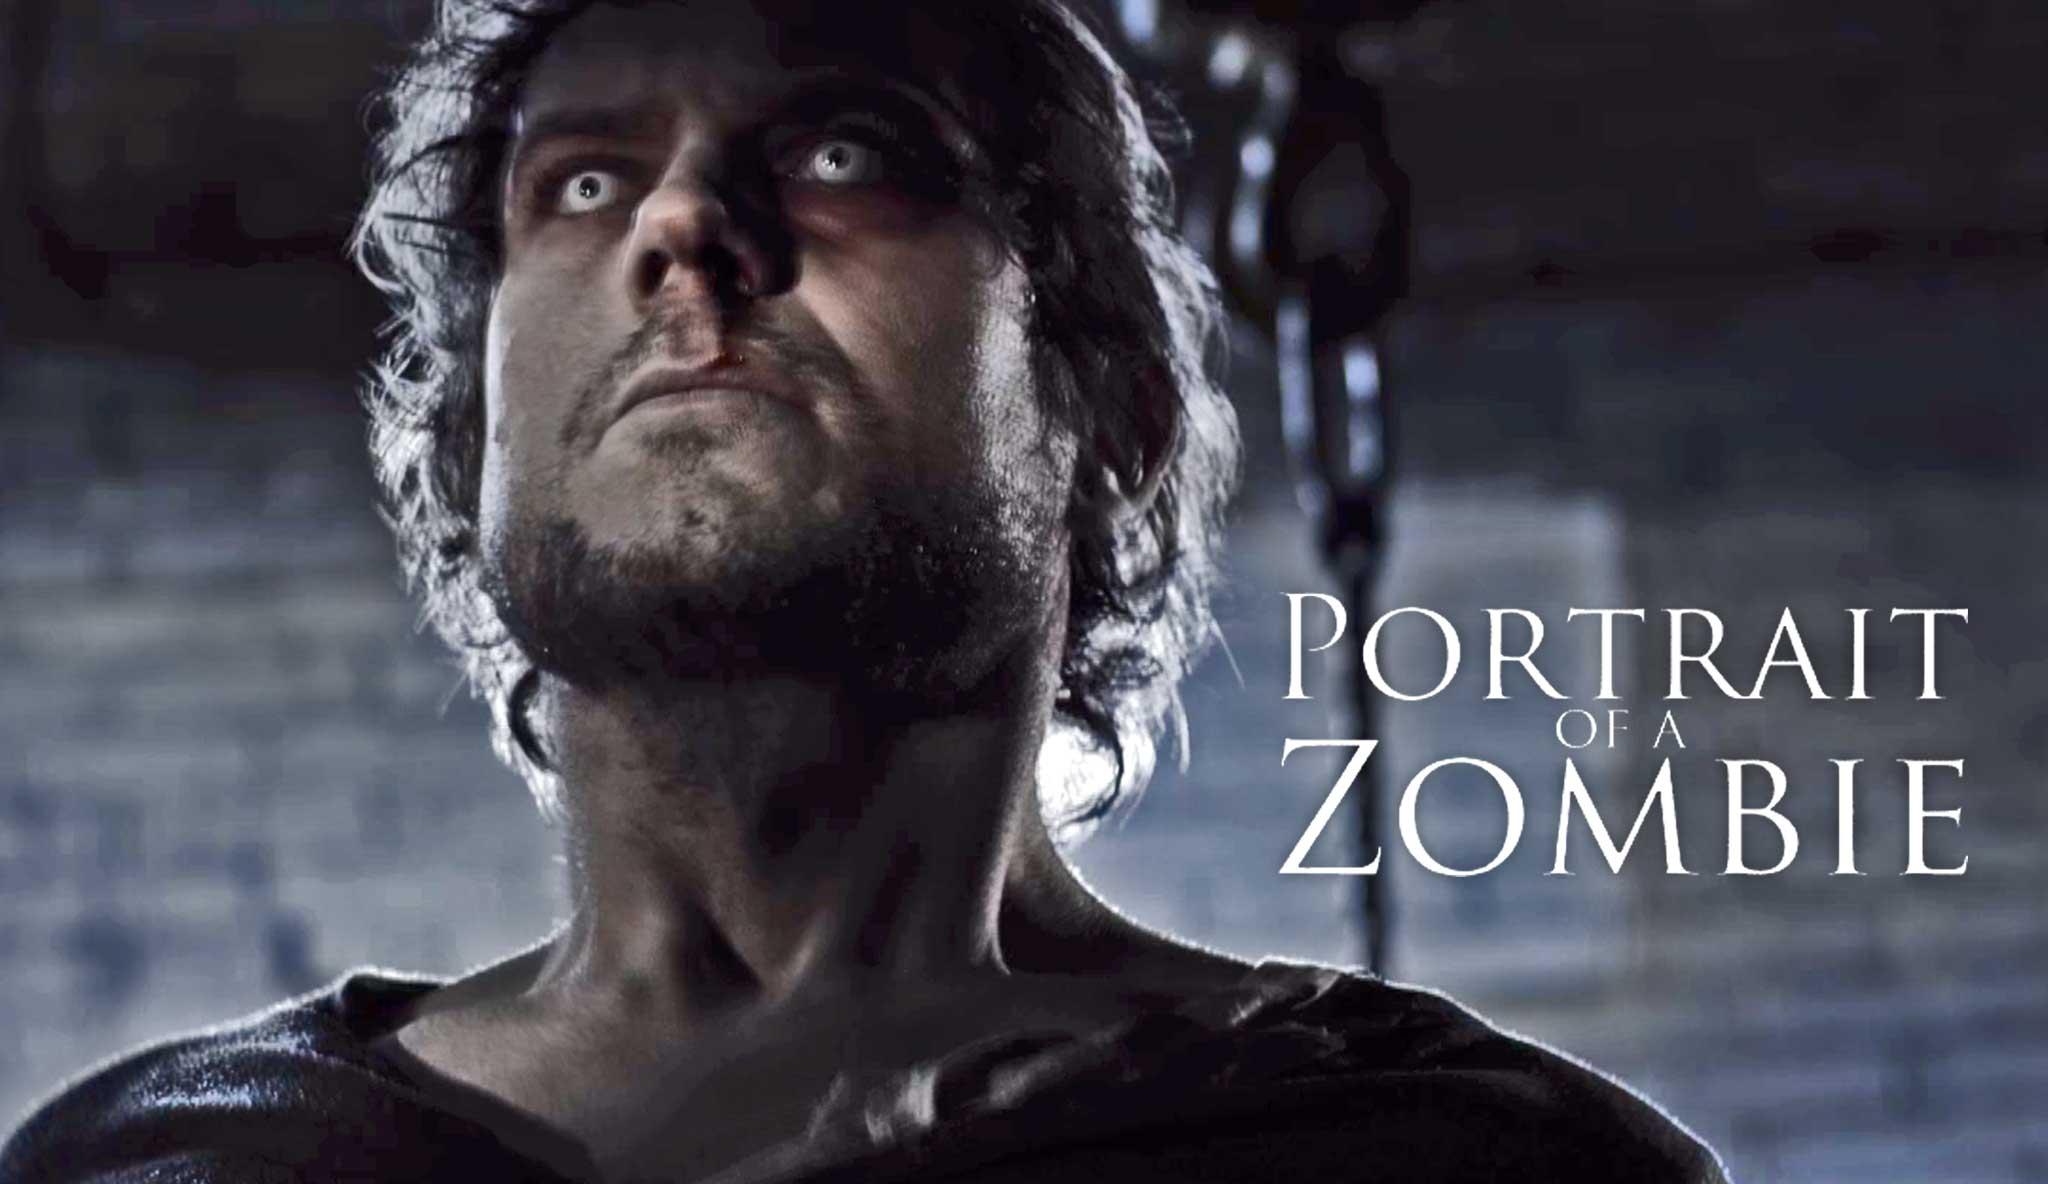 portrait-of-a-zombie\header.jpg